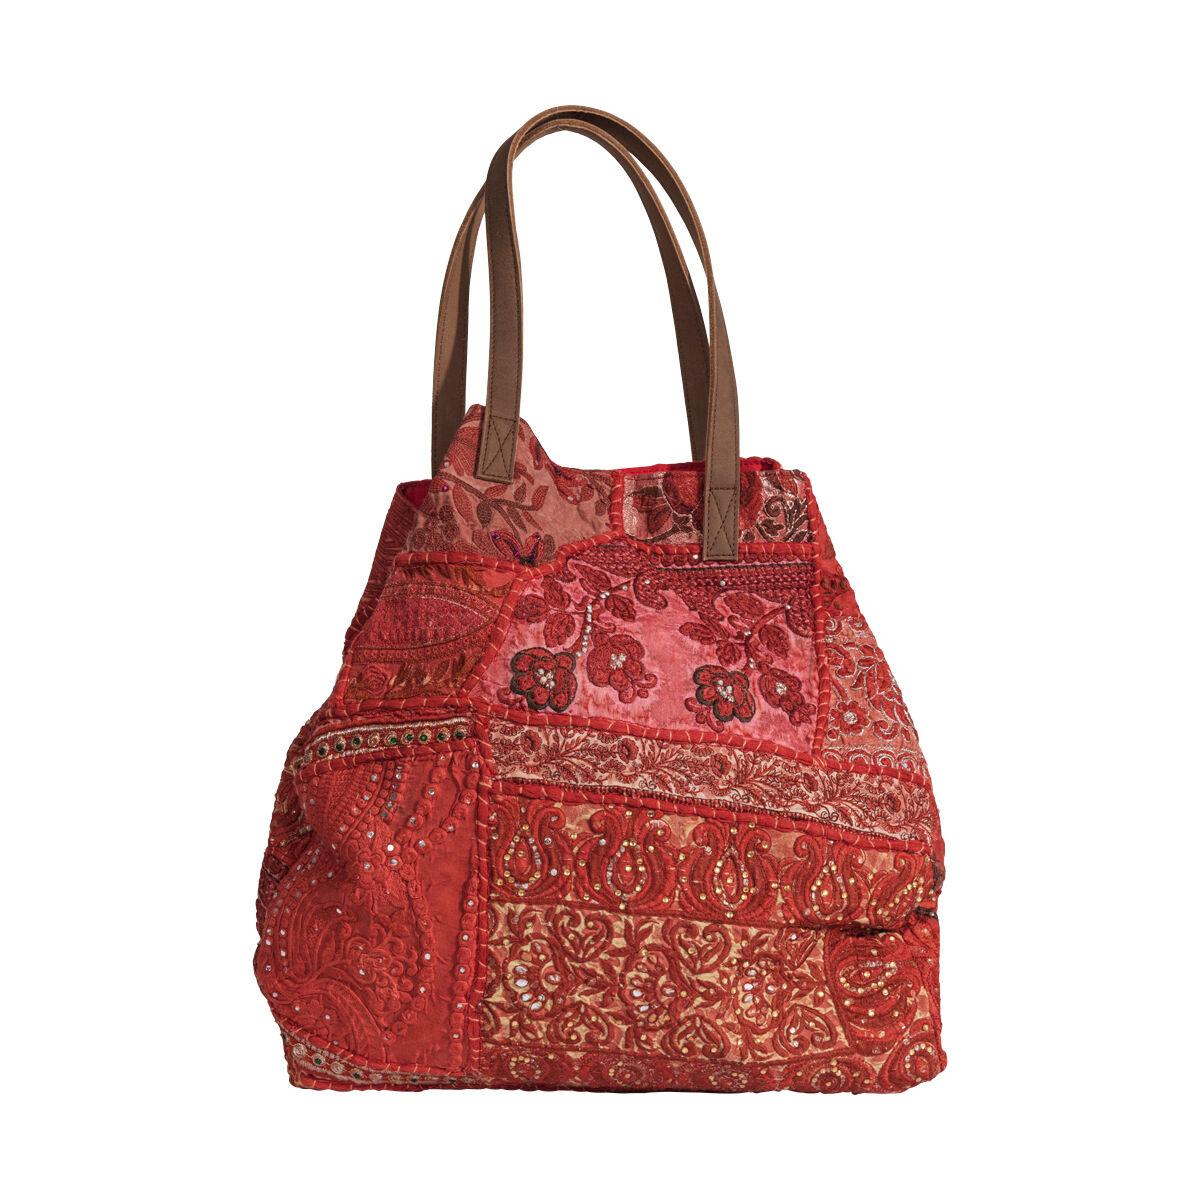 0037396_shoulder-bag-ritikka-rusty